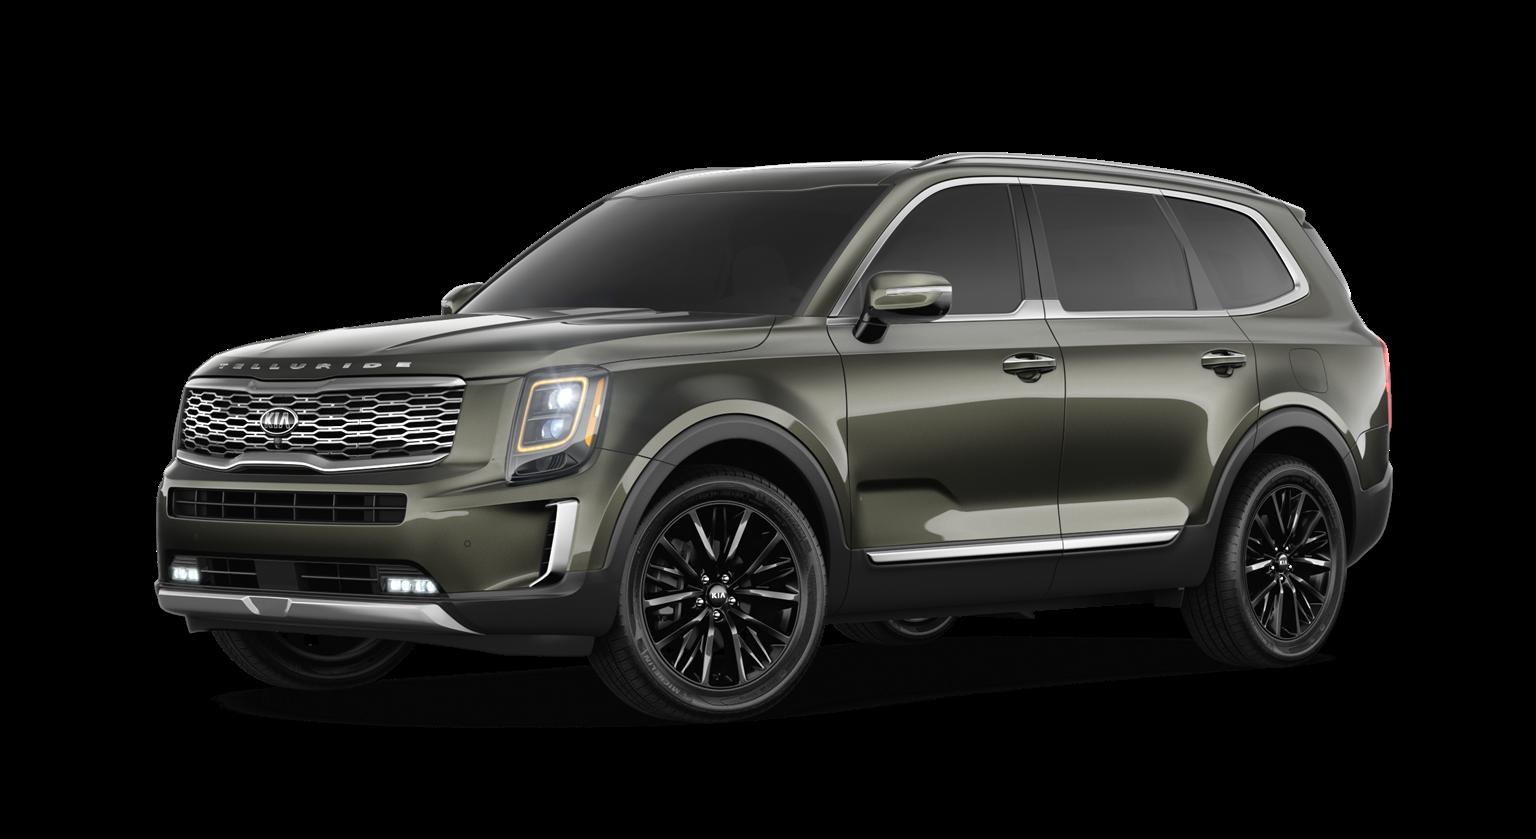 2020 Kia Telluride Build Price Summary Kia Https Www Kia Com Us En Build Telluride 2020 Summary Trim 8 Model 854 Ex Kia Best Midsize Suv Mid Size Suv